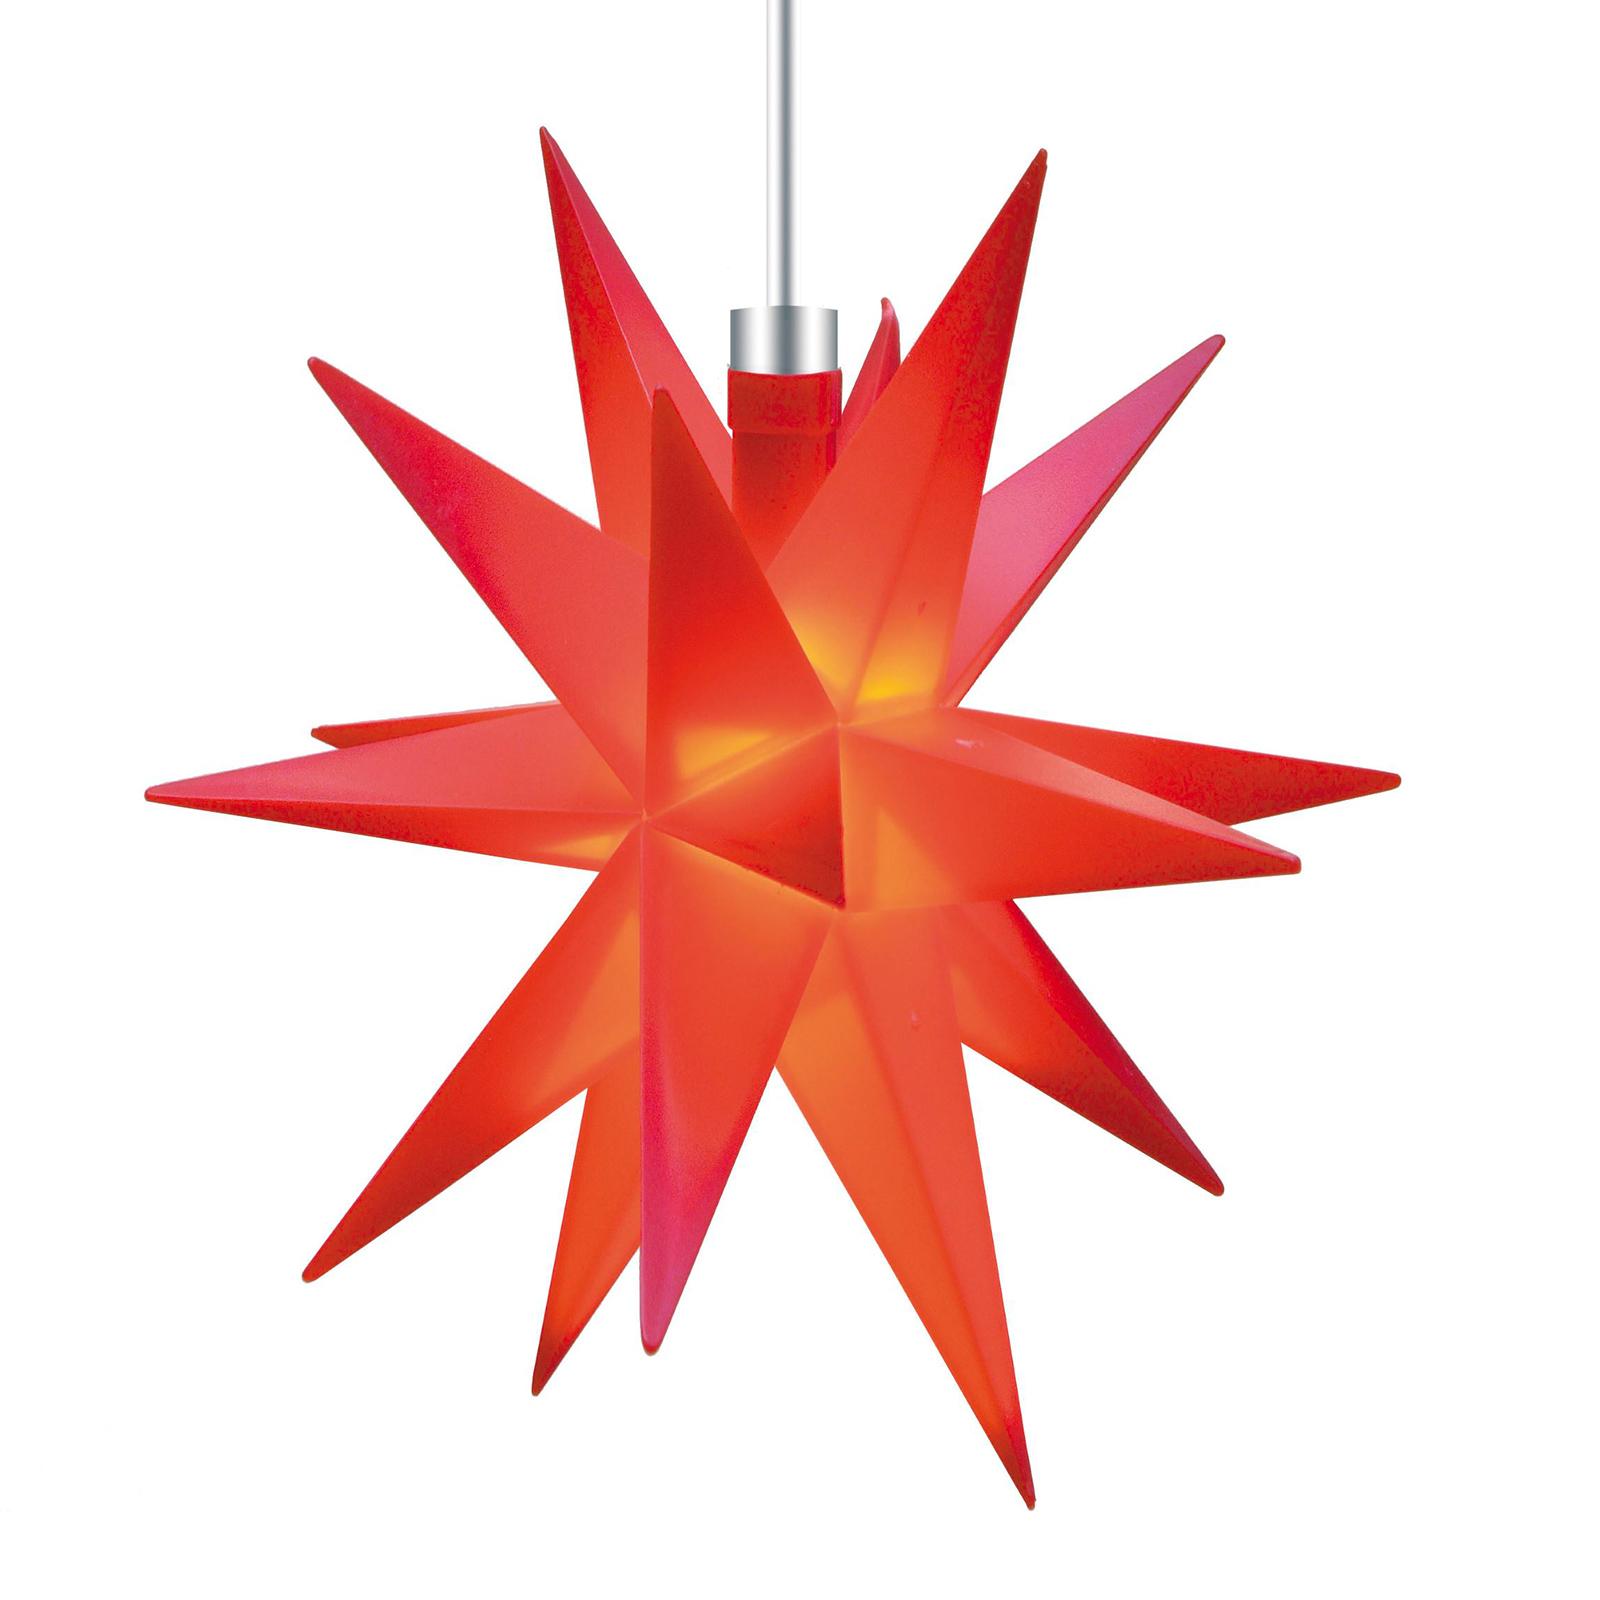 Heminredning - 18-uddig stjärna Ø 12 cm röd